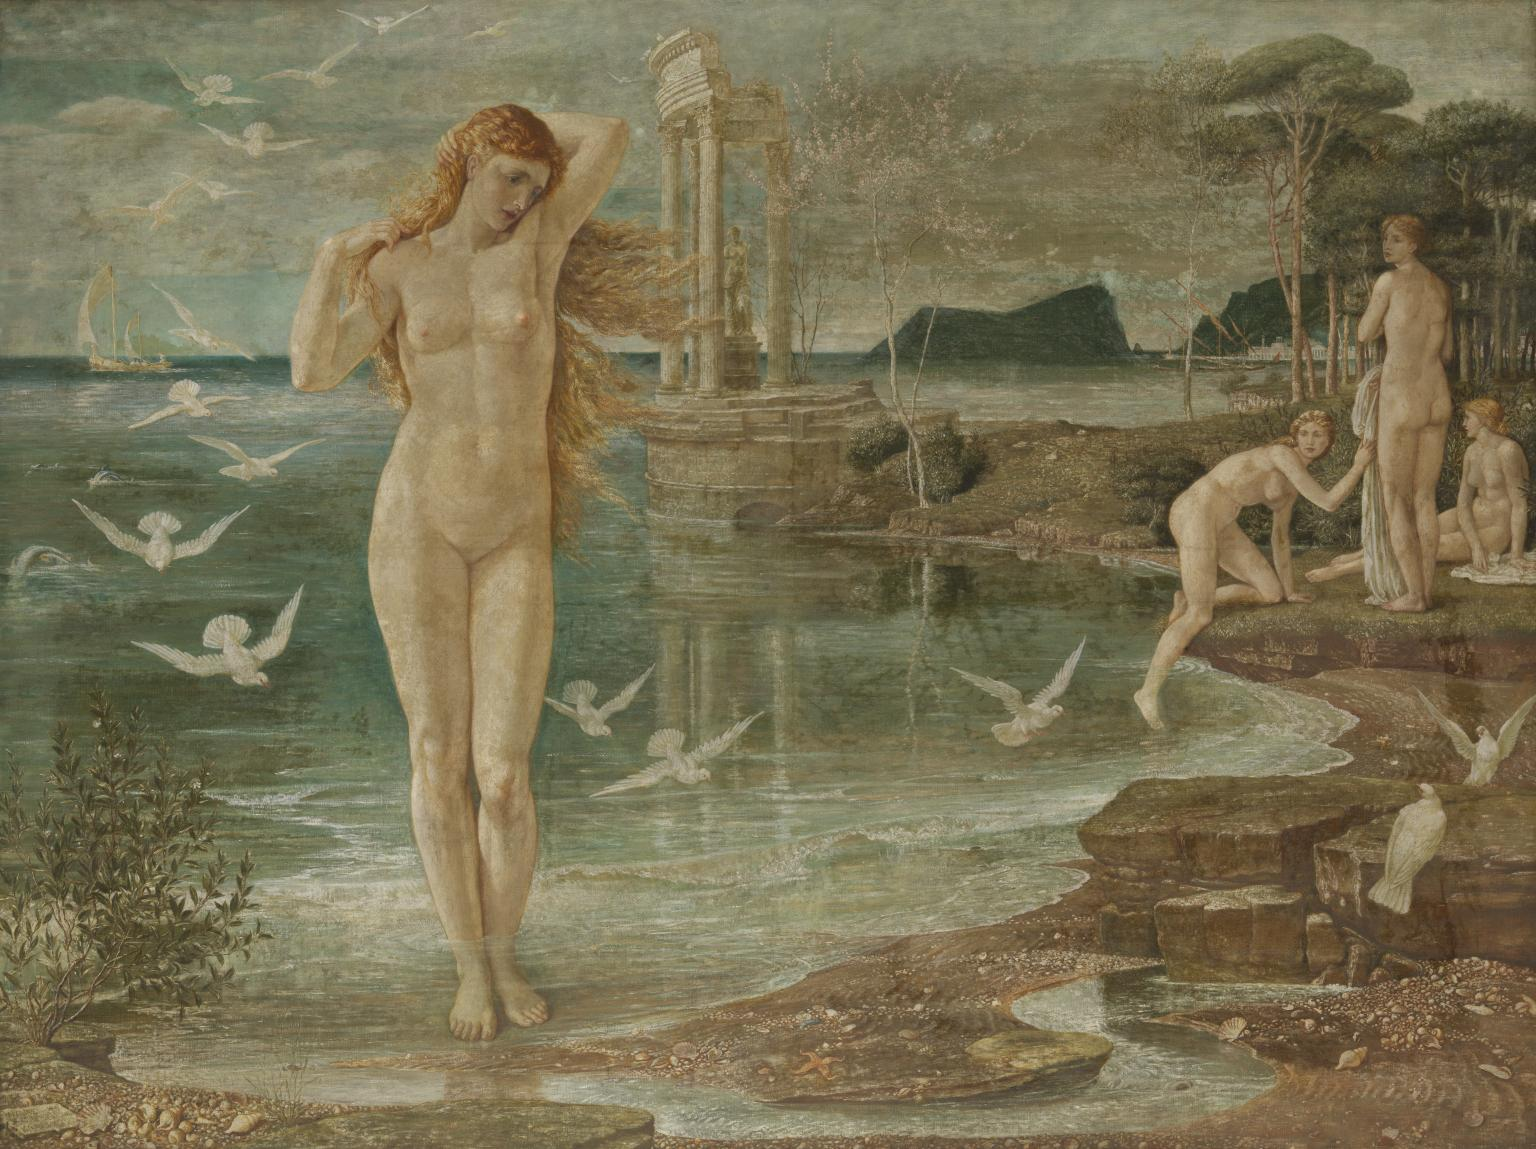 Painting: Crane. The Renaissance of Venus